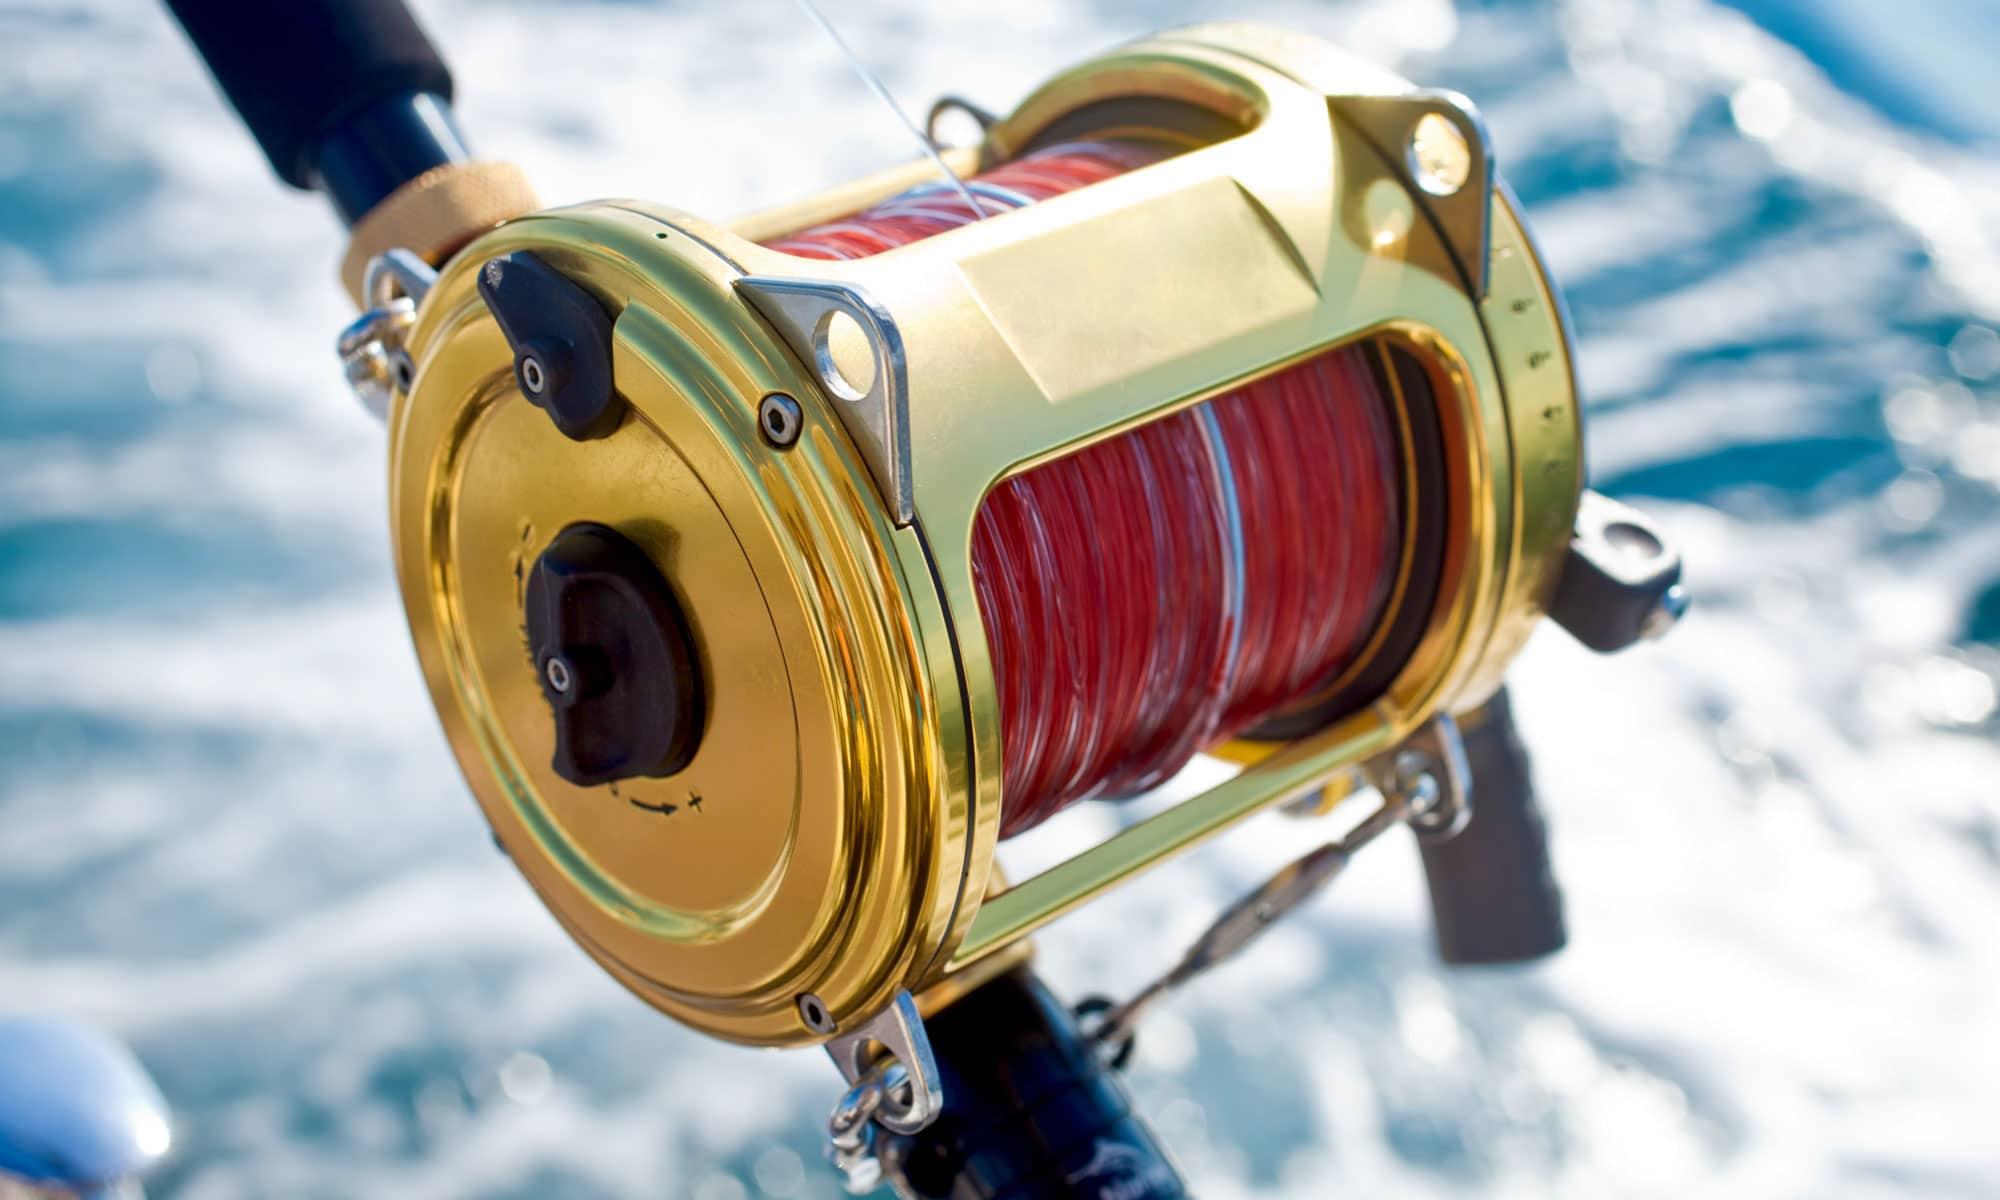 Best Ultralight Spinning Reels Reviewed in Detail